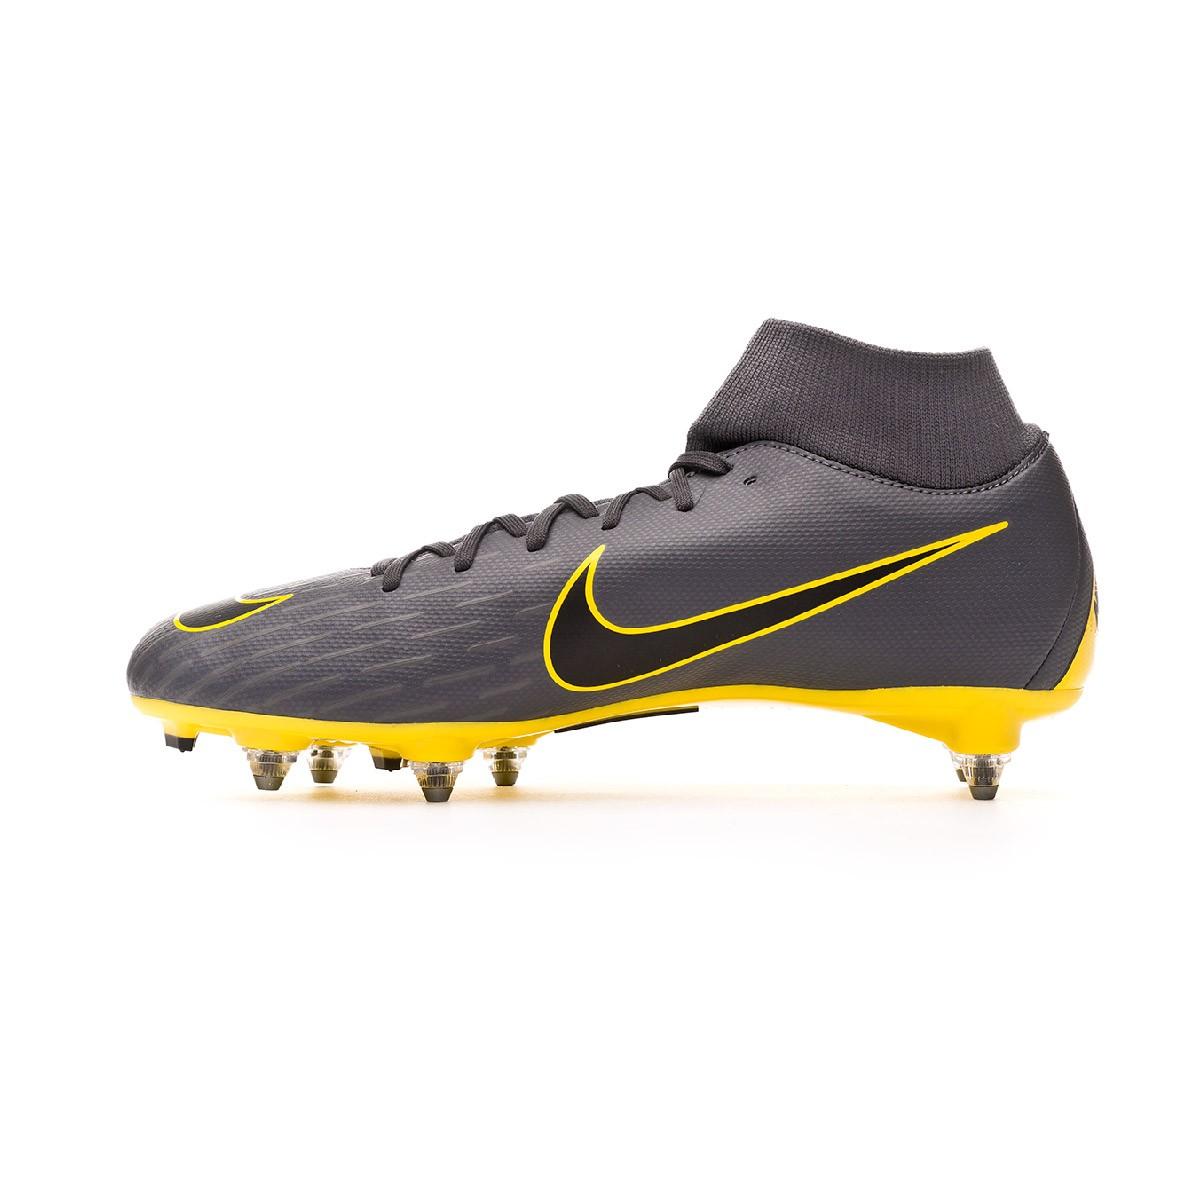 5d3b8235c Football Boots Nike Mercurial Superfly VI Academy SG-Pro Dark grey-Black -  Football store Fútbol Emotion